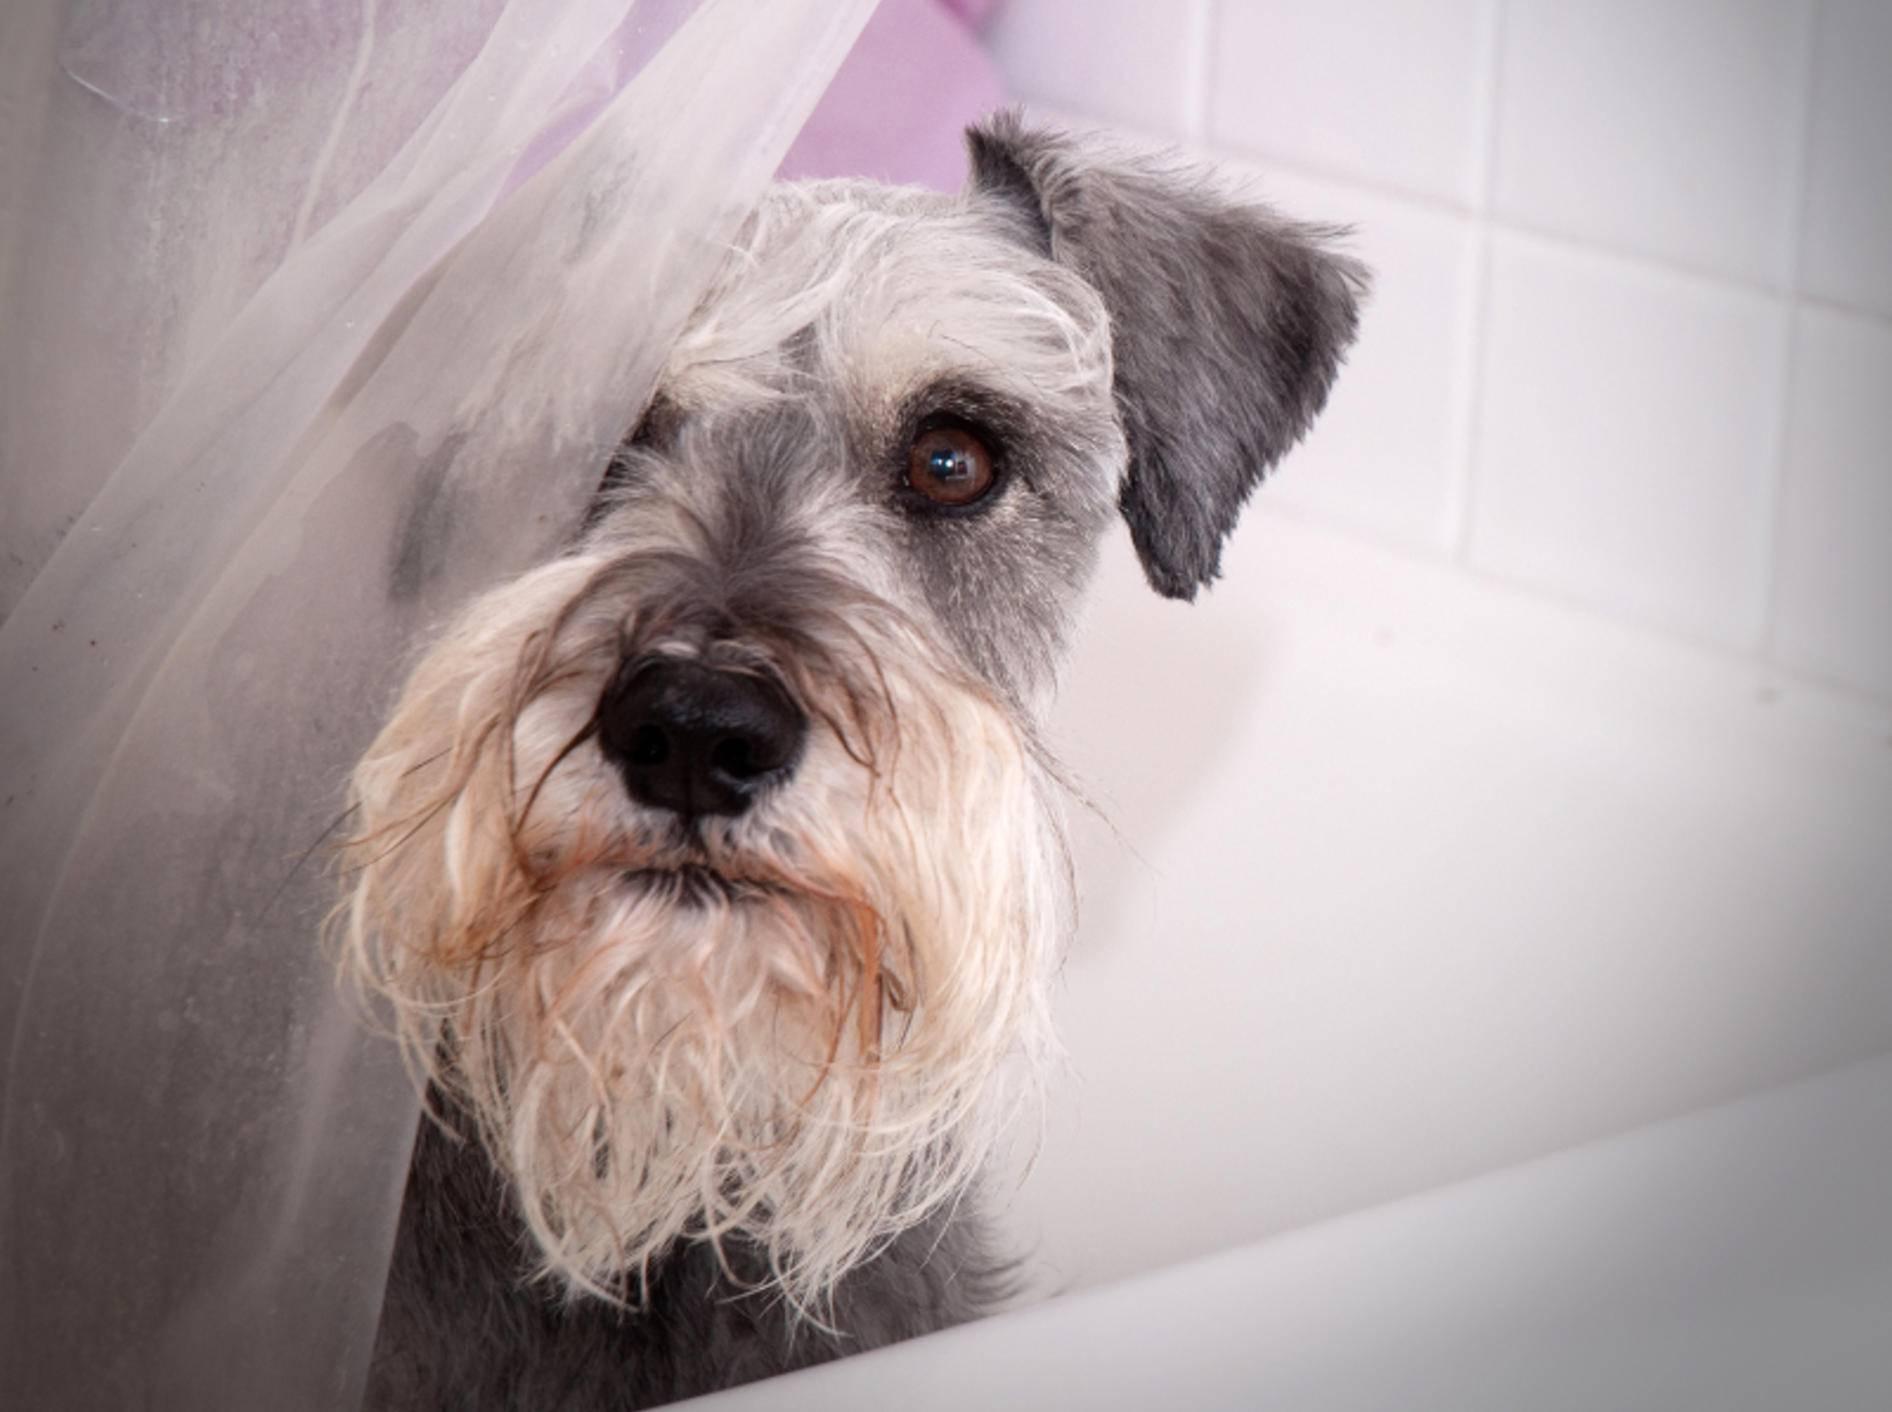 Kuckuck! – Bild: Shutterstock / Gina Callaway